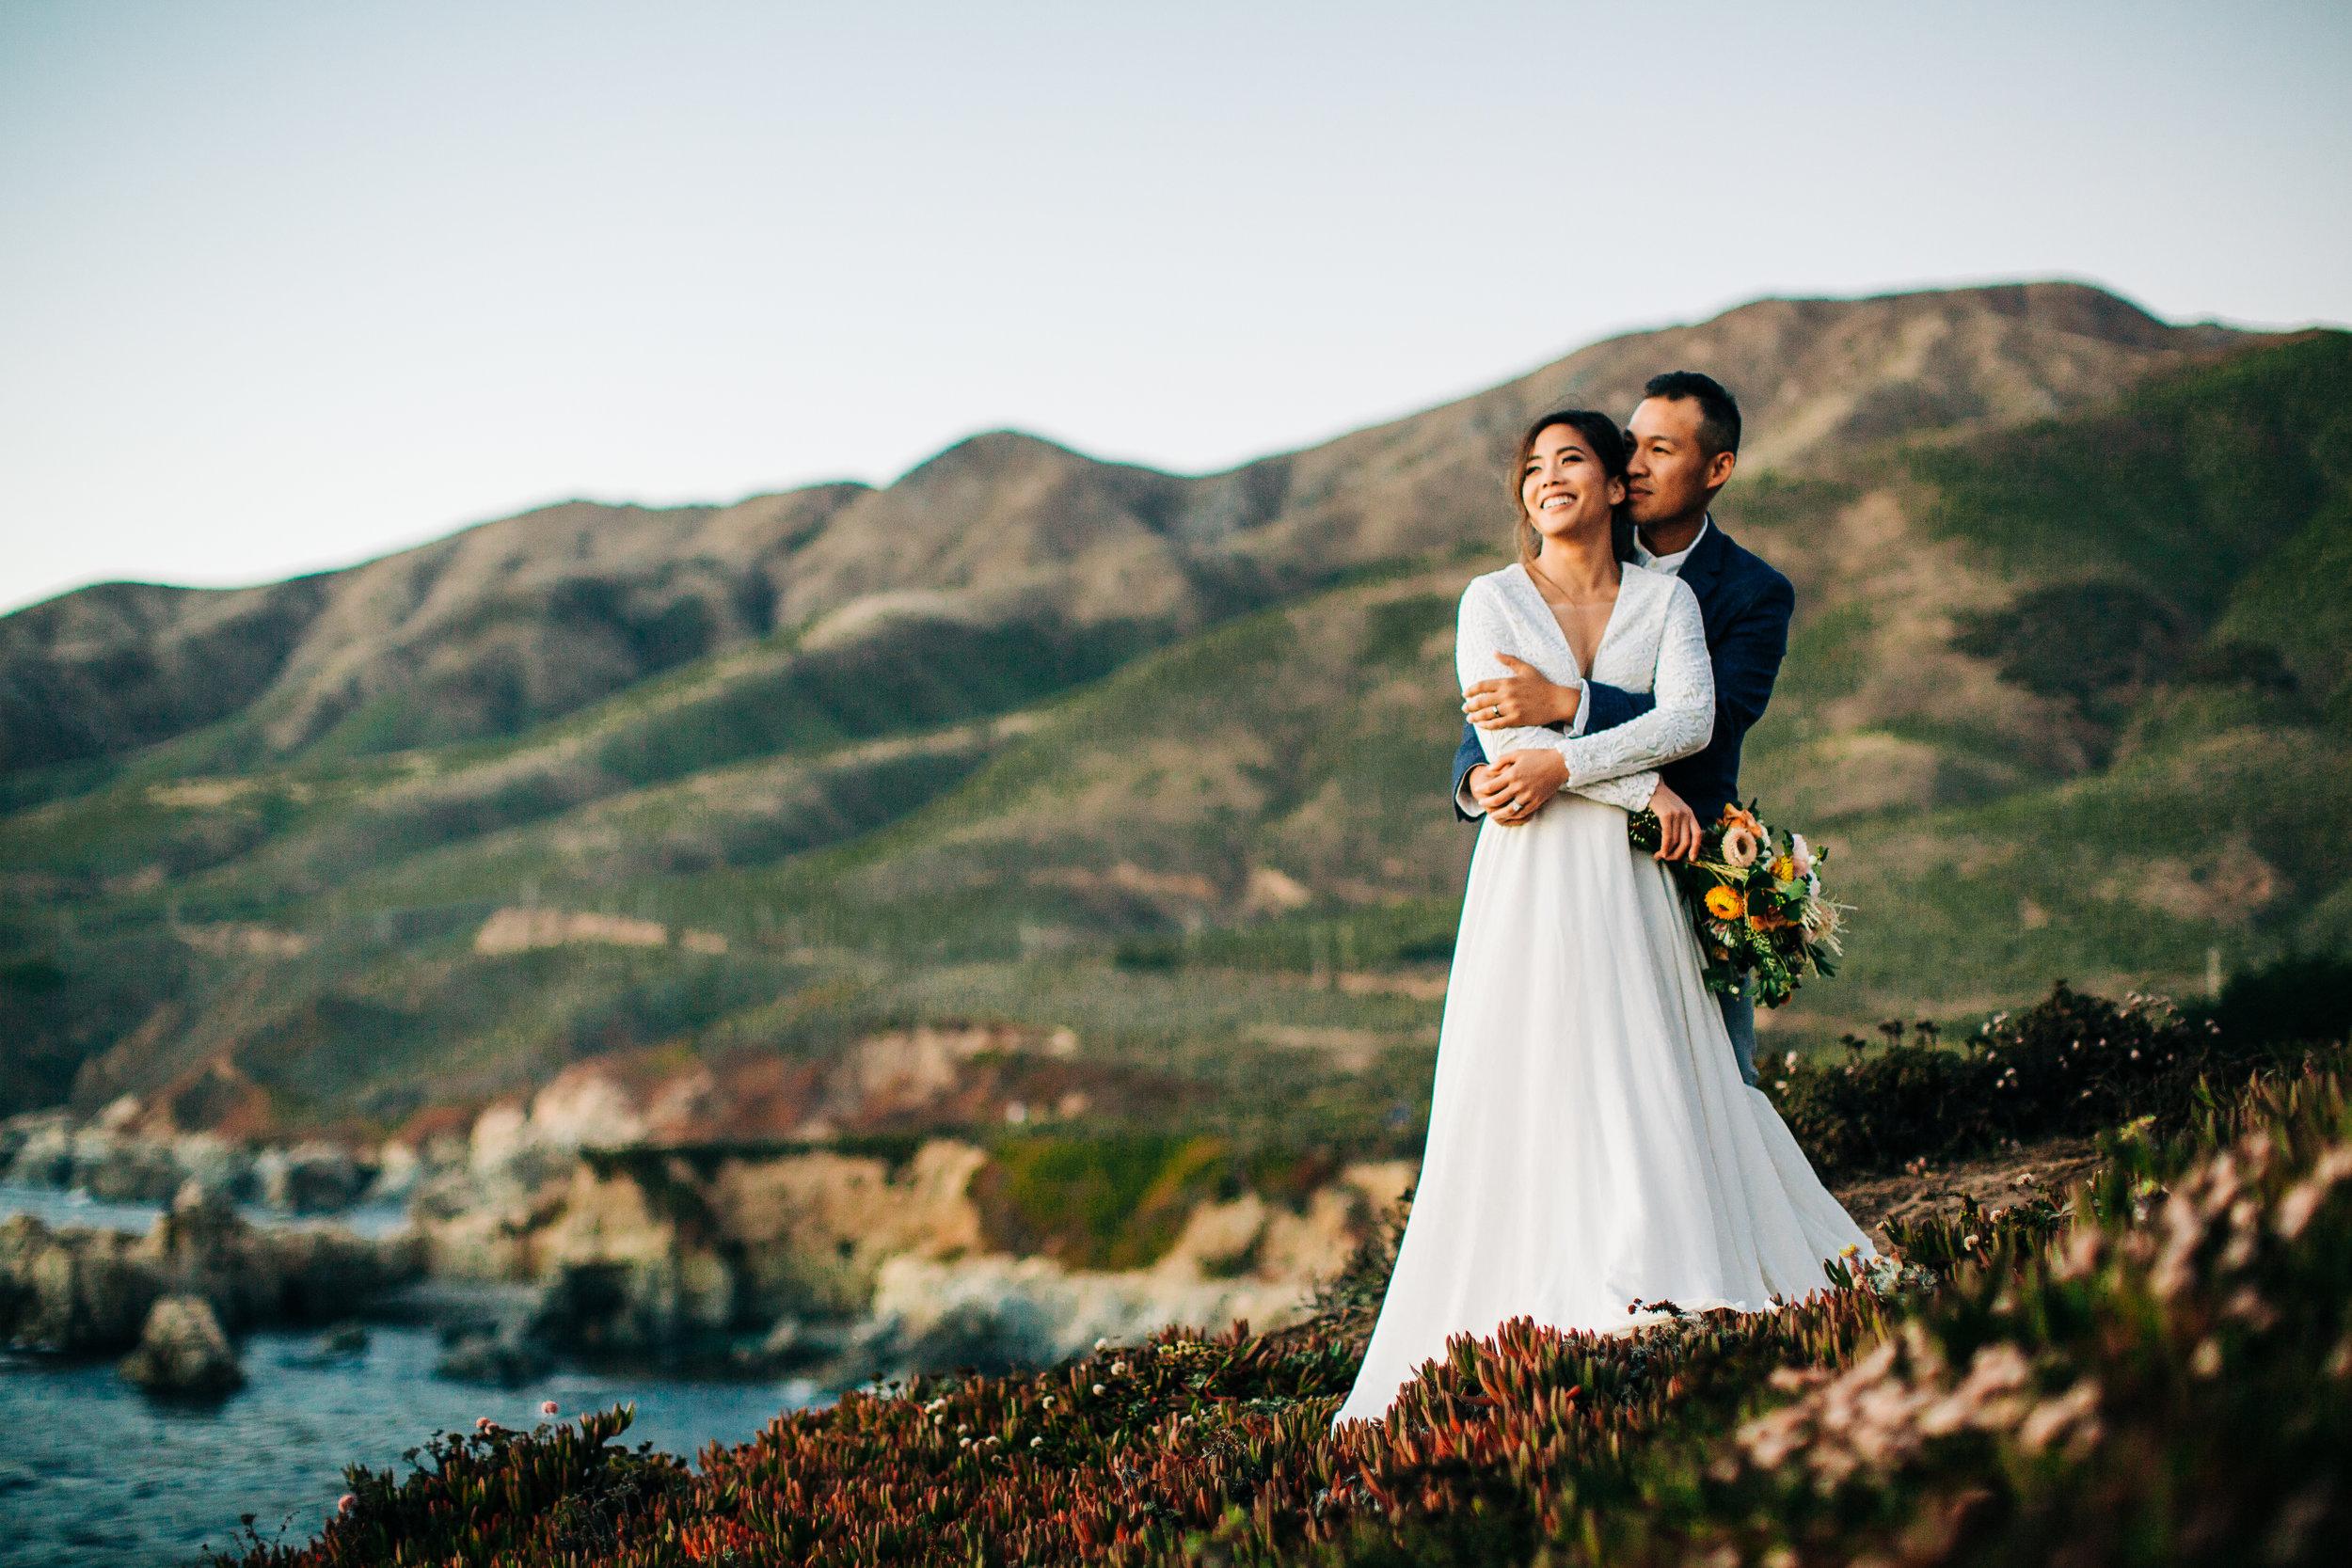 Ashley Pieper Photography | Wedding, Elopement, and Destination Photographer | Big Sur California Elopement | Sunset Elopement